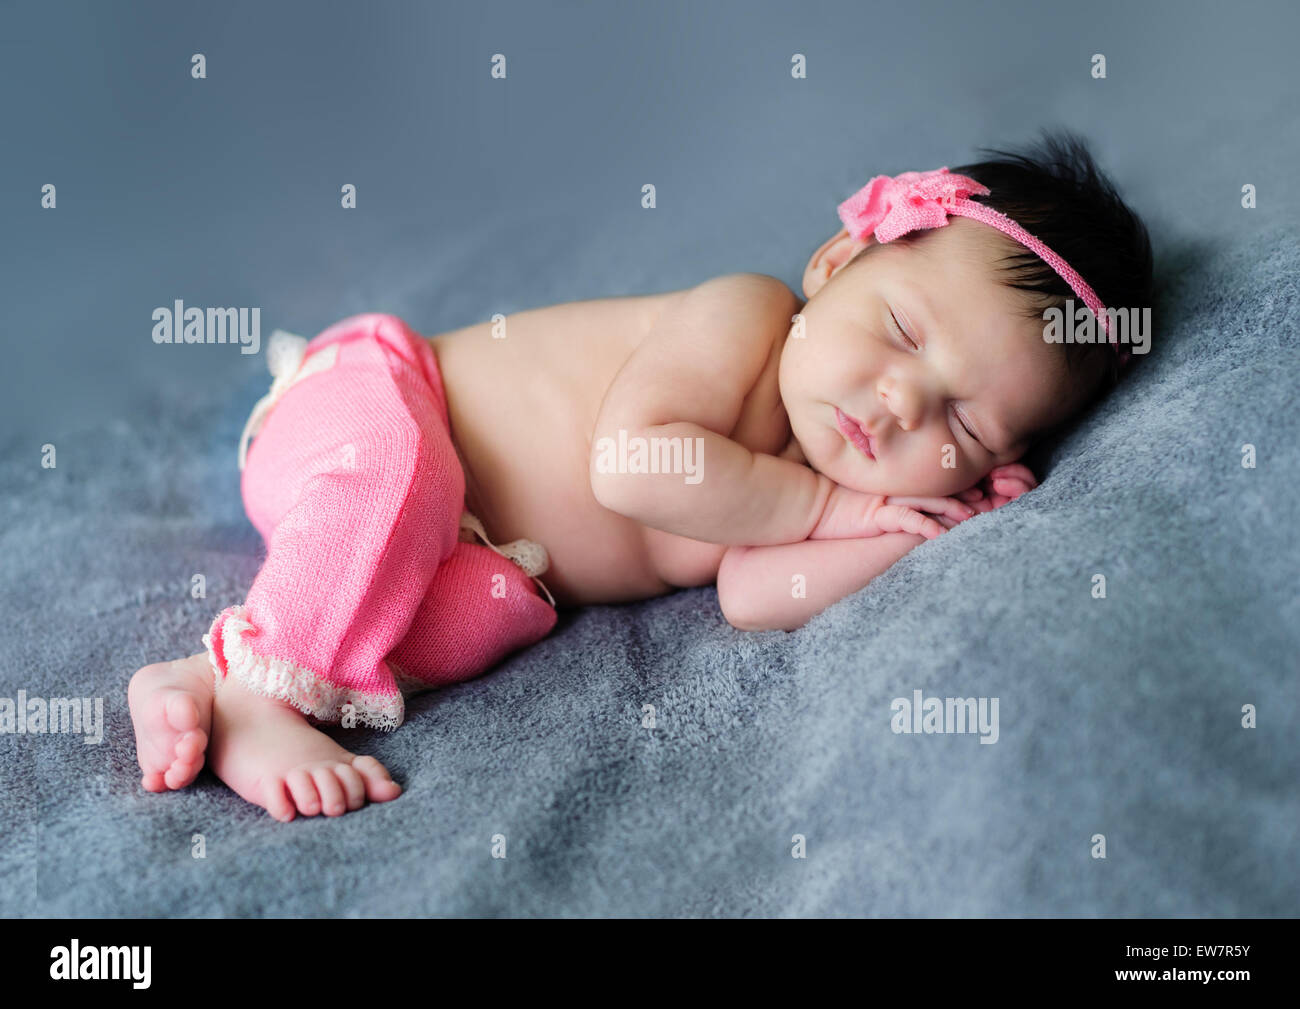 Baby girl smiling in her sleep - Stock Image